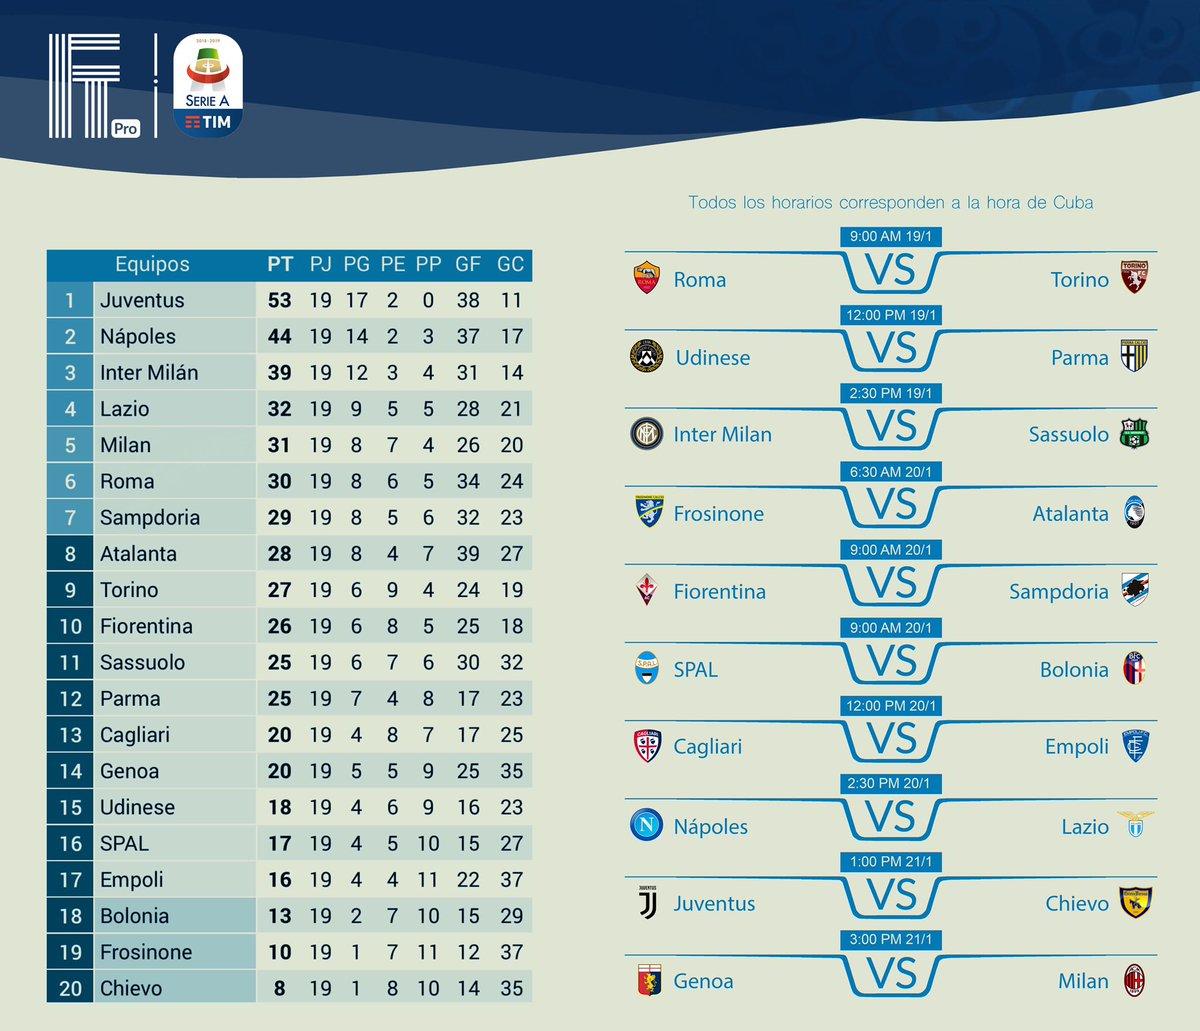 Serie A 🇮🇹🏆⚽️🏃♂️ Jornada 2️⃣0️⃣ • MÁS INFORMACIÓN EN NUESTRO CANAL DE YOUTUBE 😉 Link: http://youtu.be/Y31Zvadjt4o • #FTPro #FTPLI20 #juventus #napoli #roma #lazio #inter #milan #cristiano #ronaldo #Sassuolo #Torino #juve #Napoles #soccer #futbol #holguin #cuba #fútbol #ligaitaliana